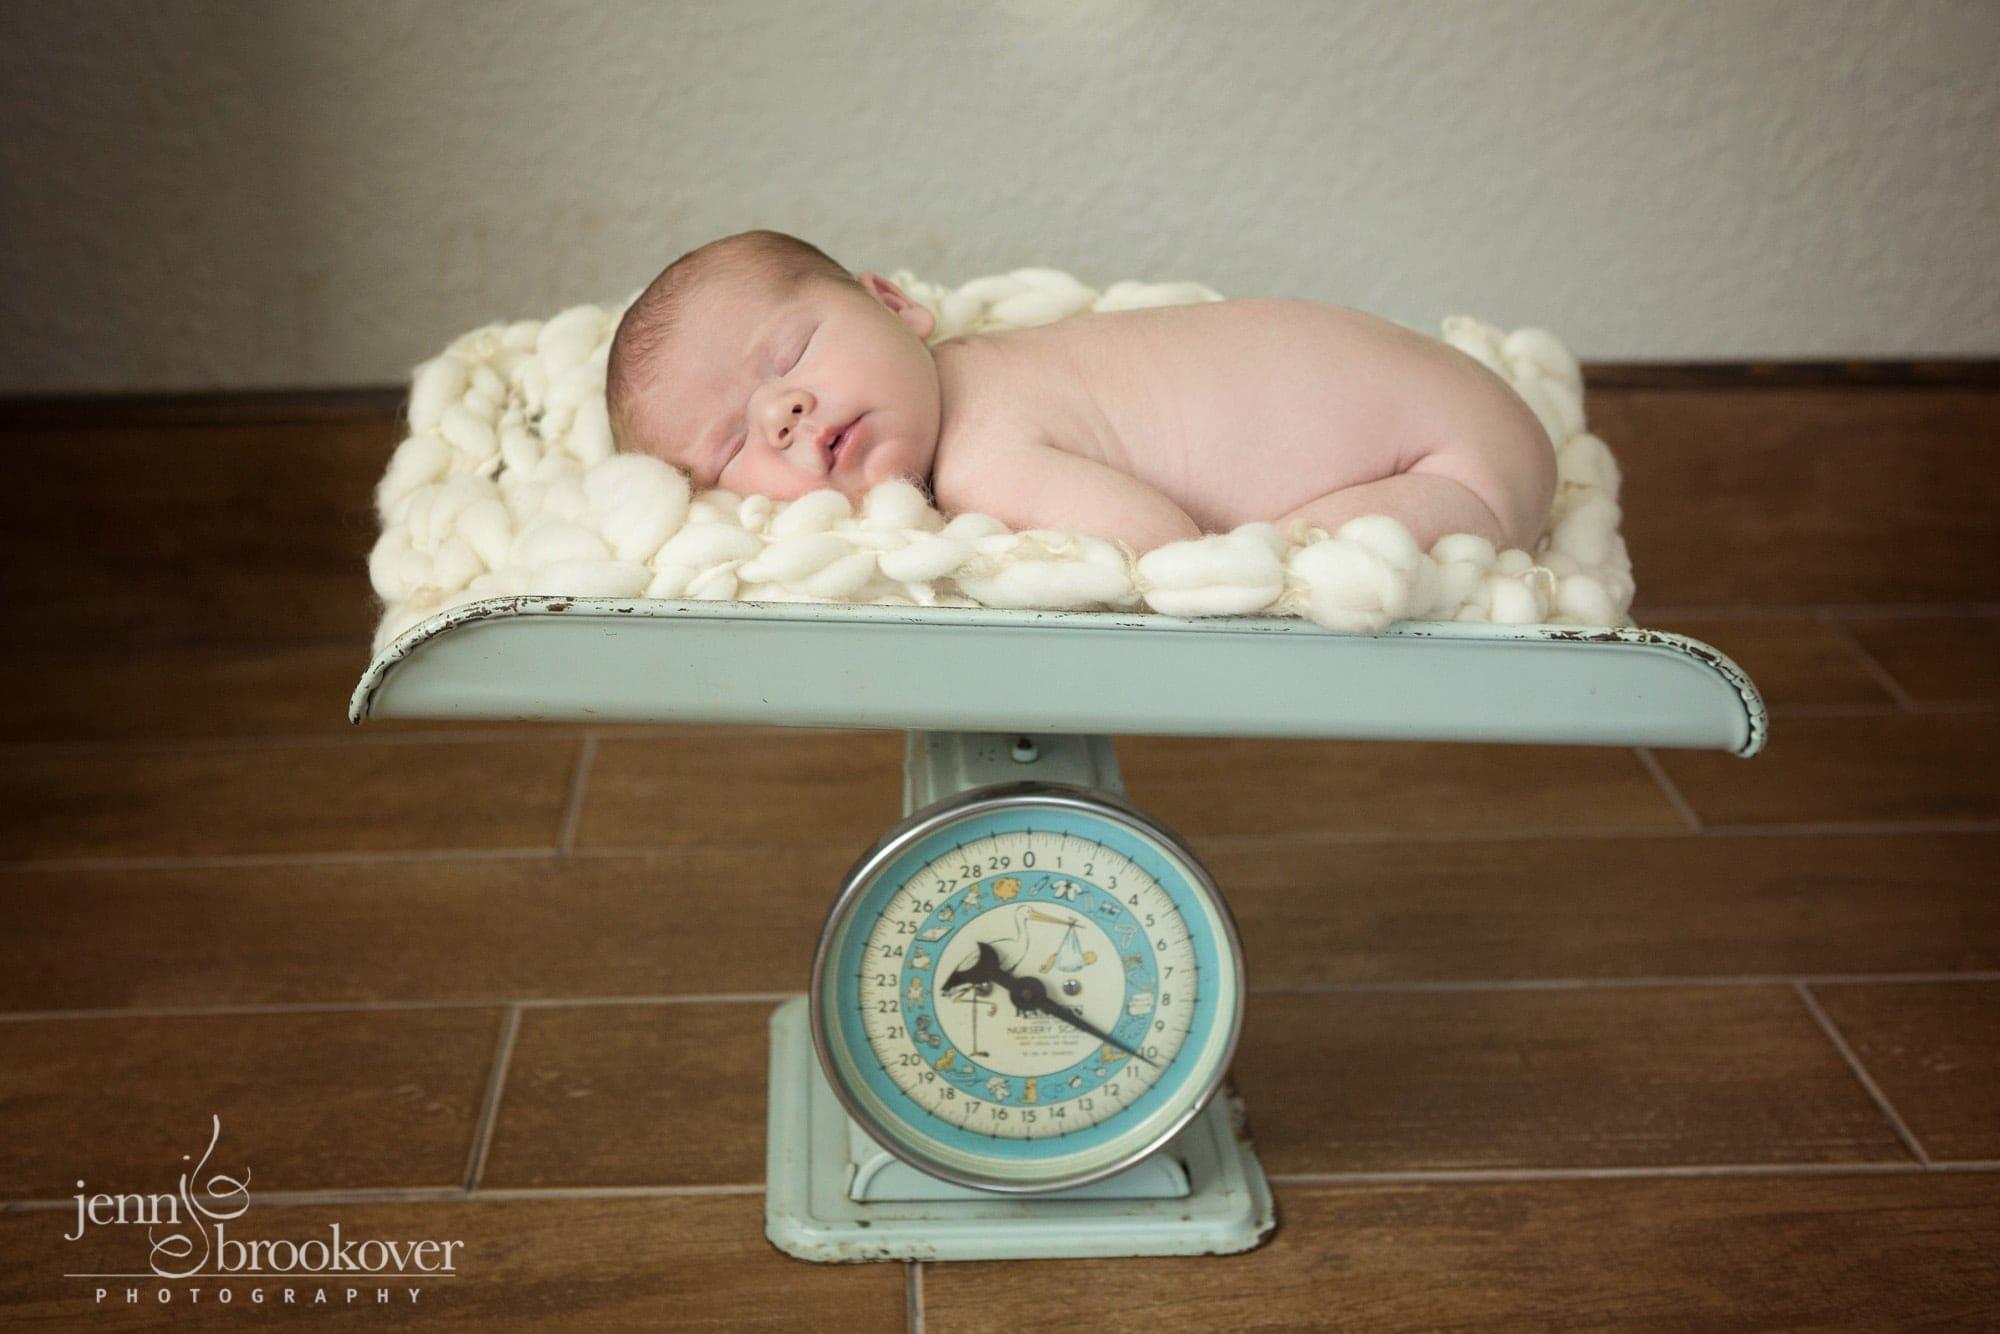 newborn asleep on vintage scale during newborn photo session